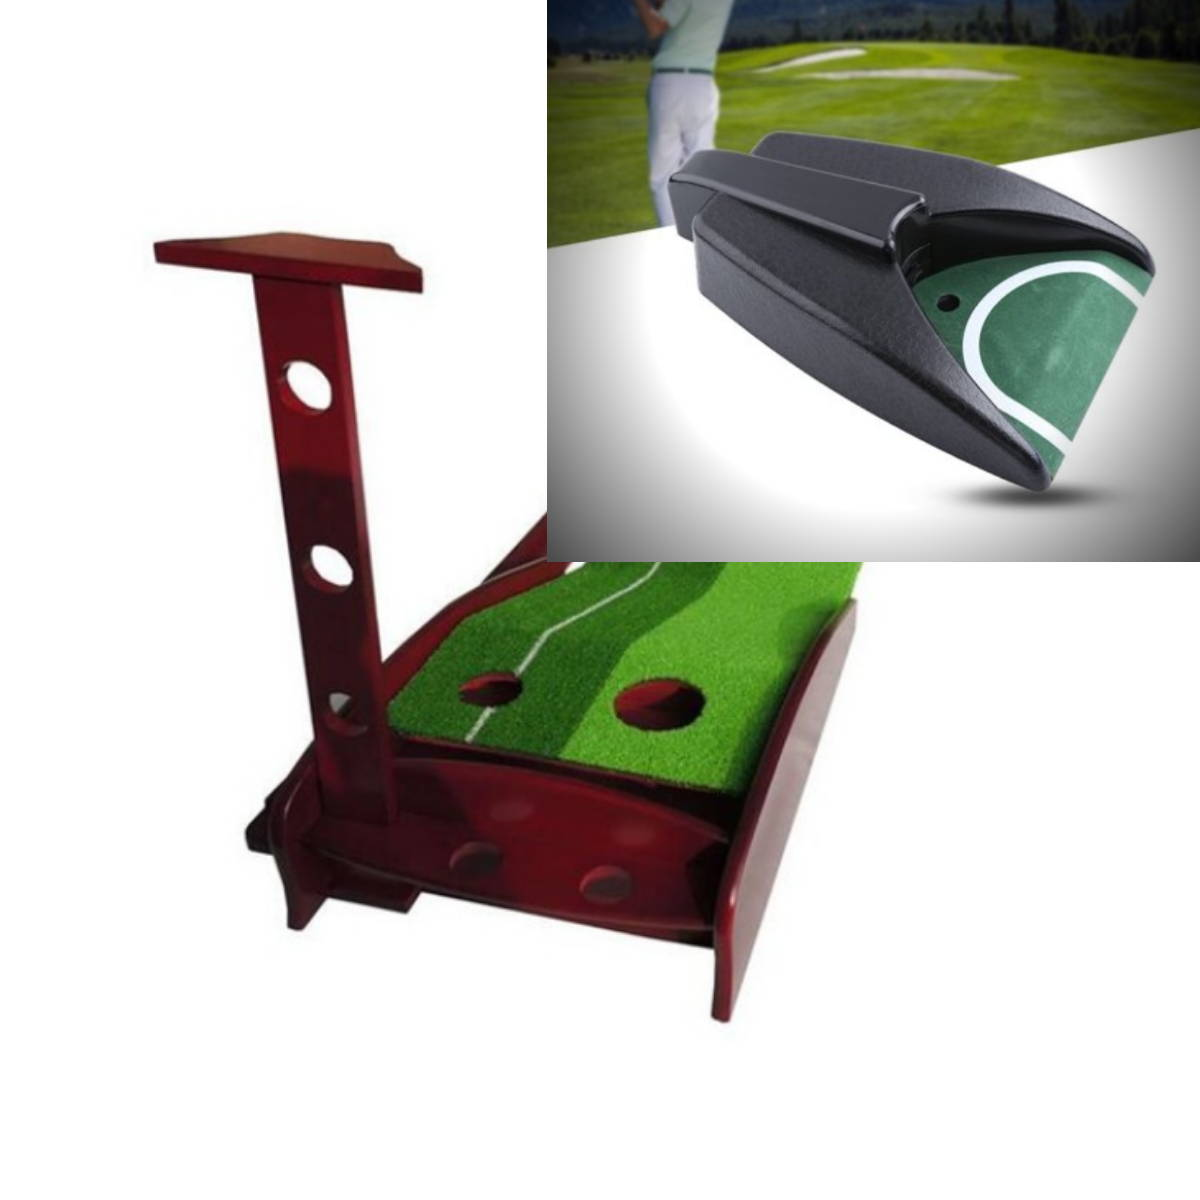 Putting Mat, Putting Green, Indoor Golf Practice